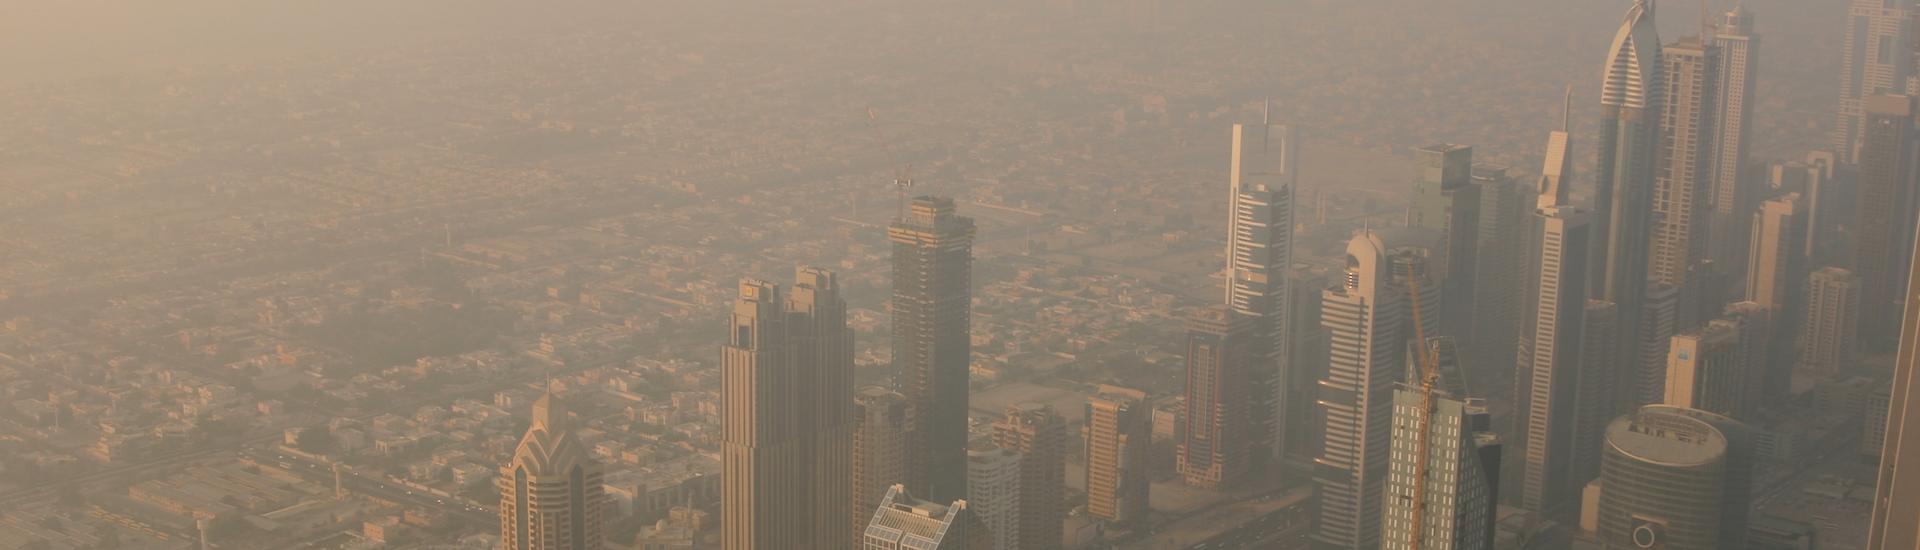 Image of Dubai from the Burj Khalifa